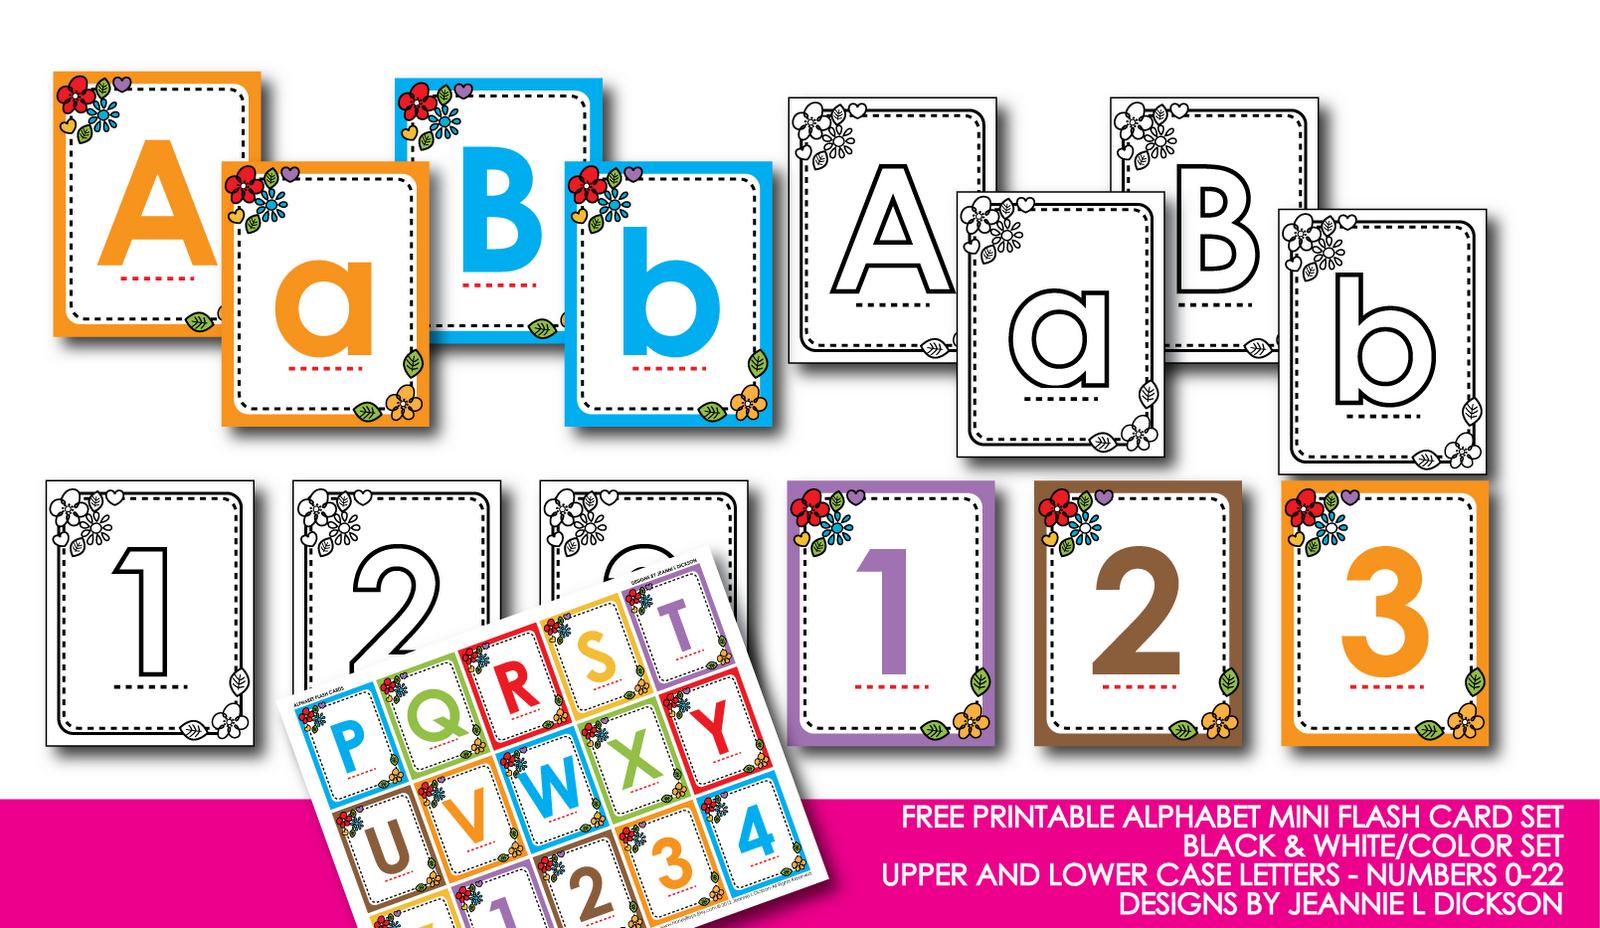 Kindergarten Alphabet Cards | Free Printable Alphabet Mini Flash - Free Printable Abc Flashcards